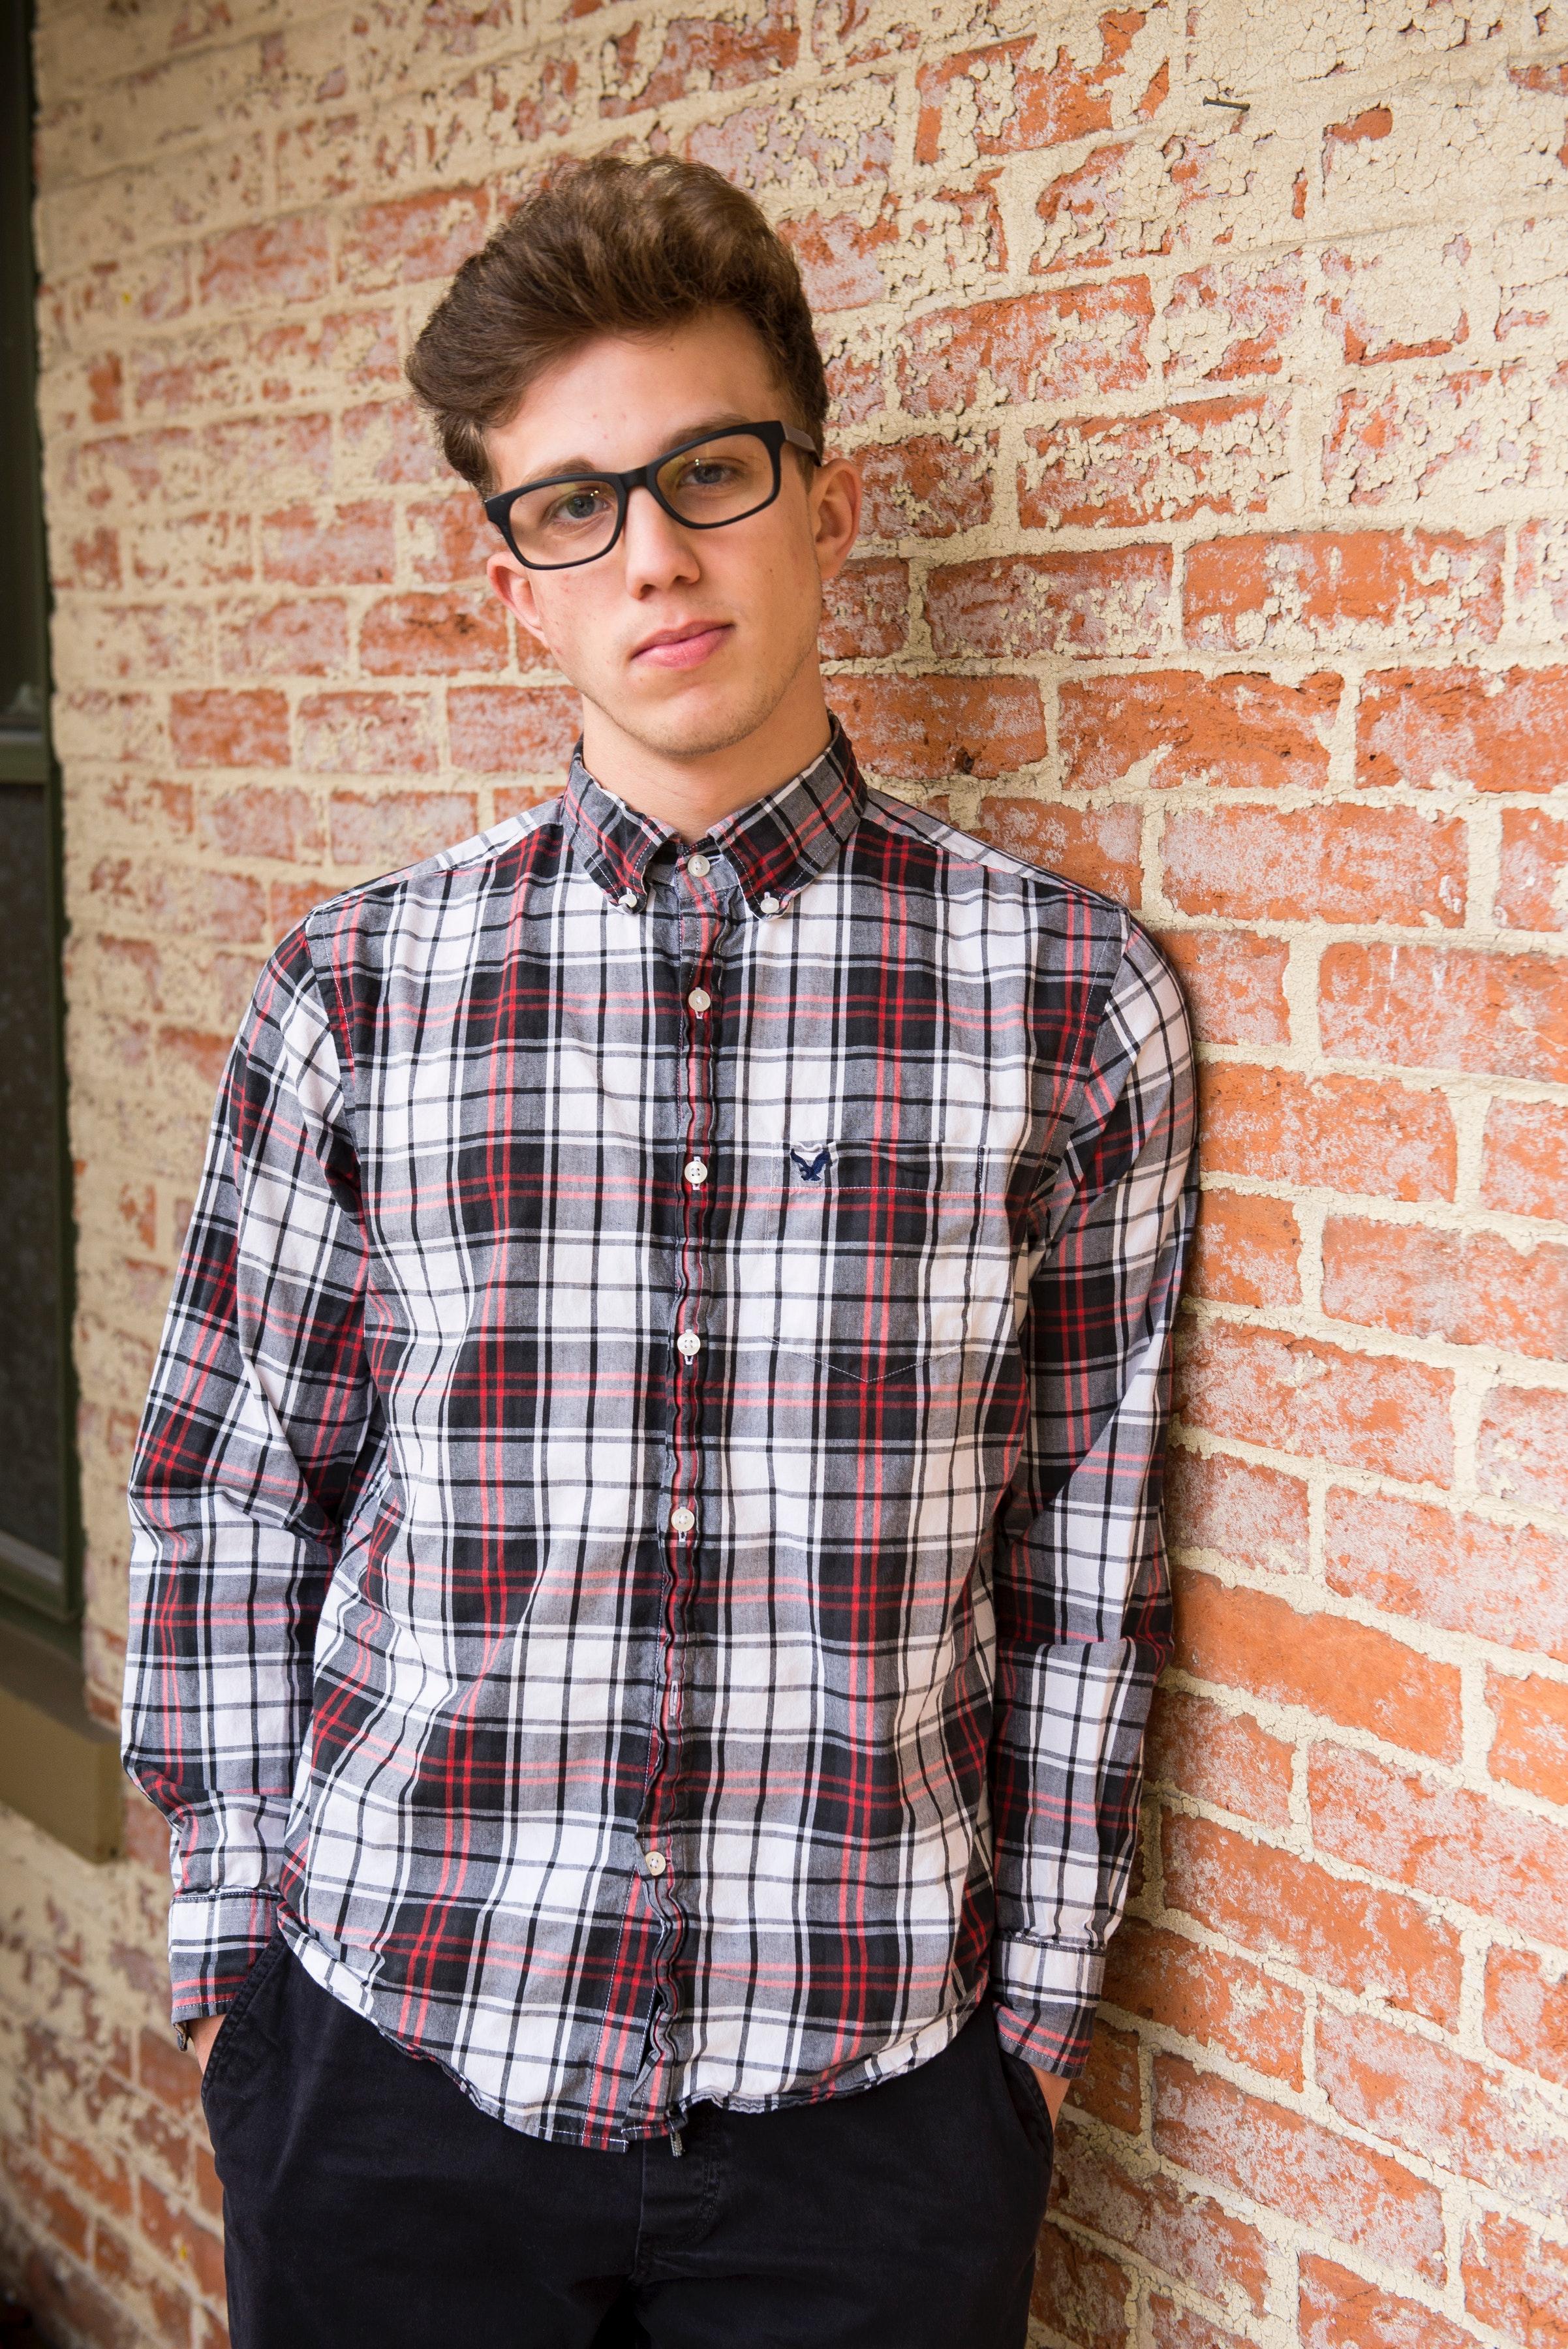 brick wall casual eyeglasses eyewear fashion fashionable fine looking good  looking man person shirt style trendy 4c11b610a948